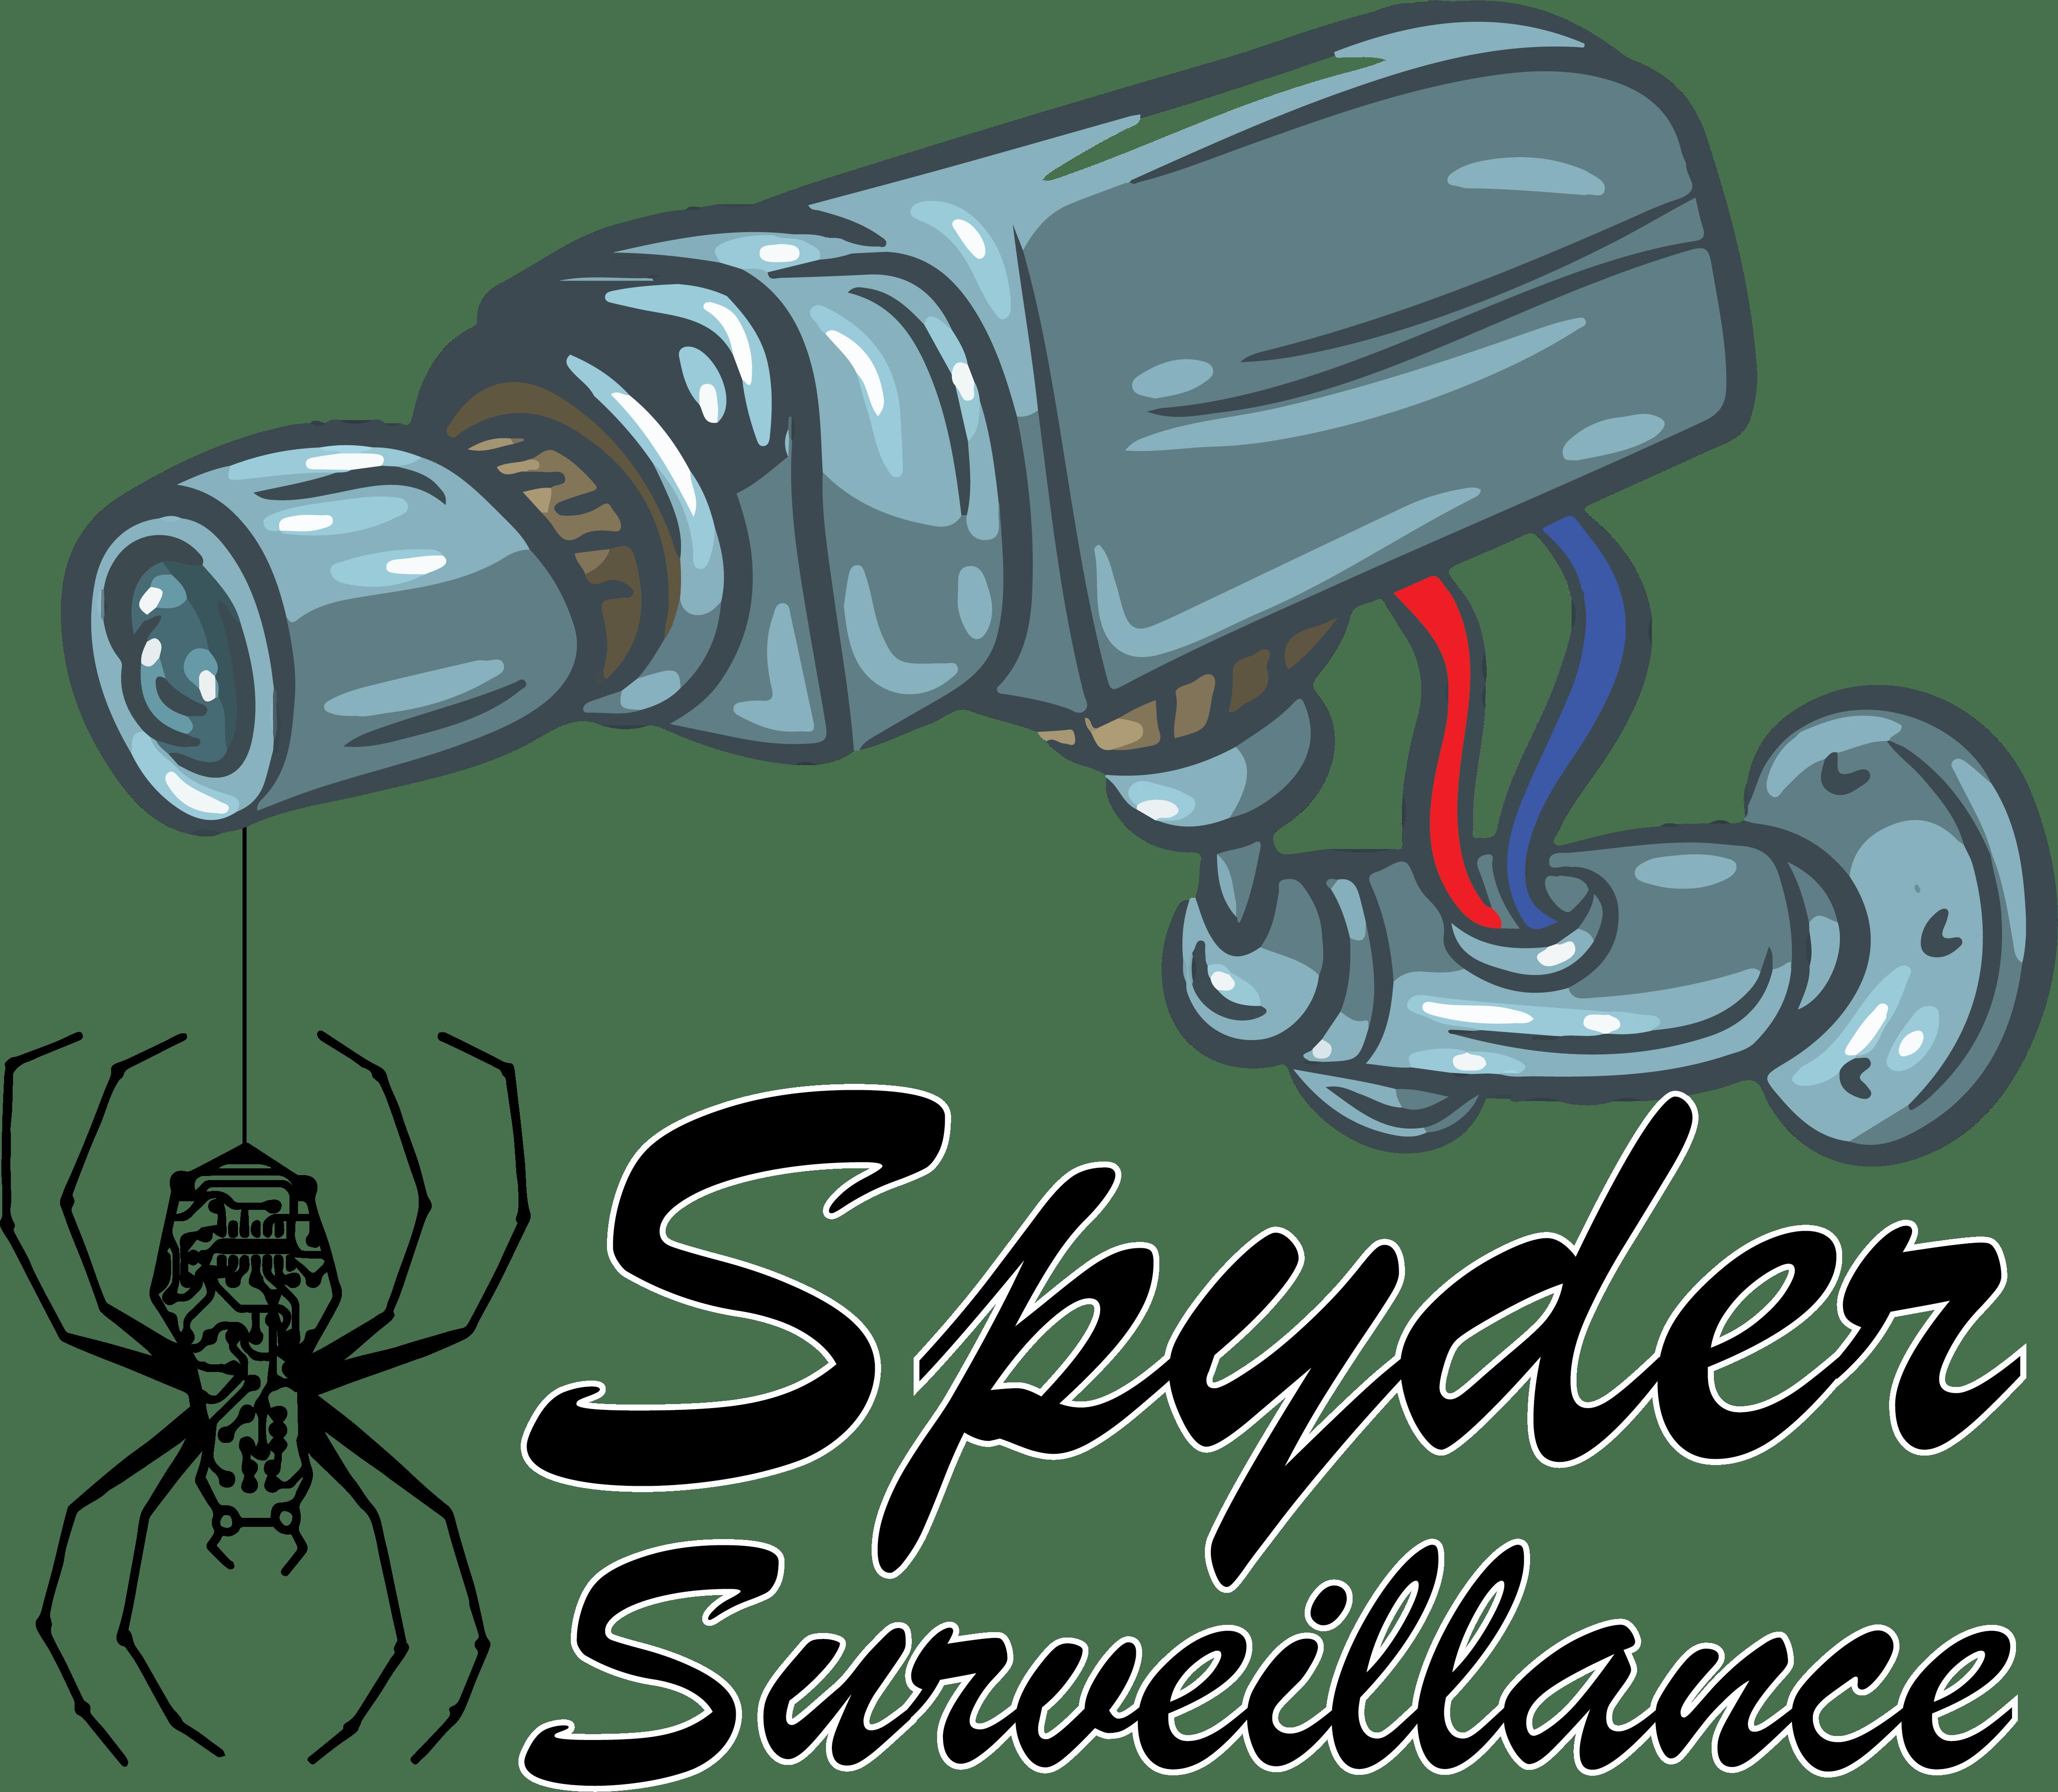 Computer Hardware Spyder llc. Logo